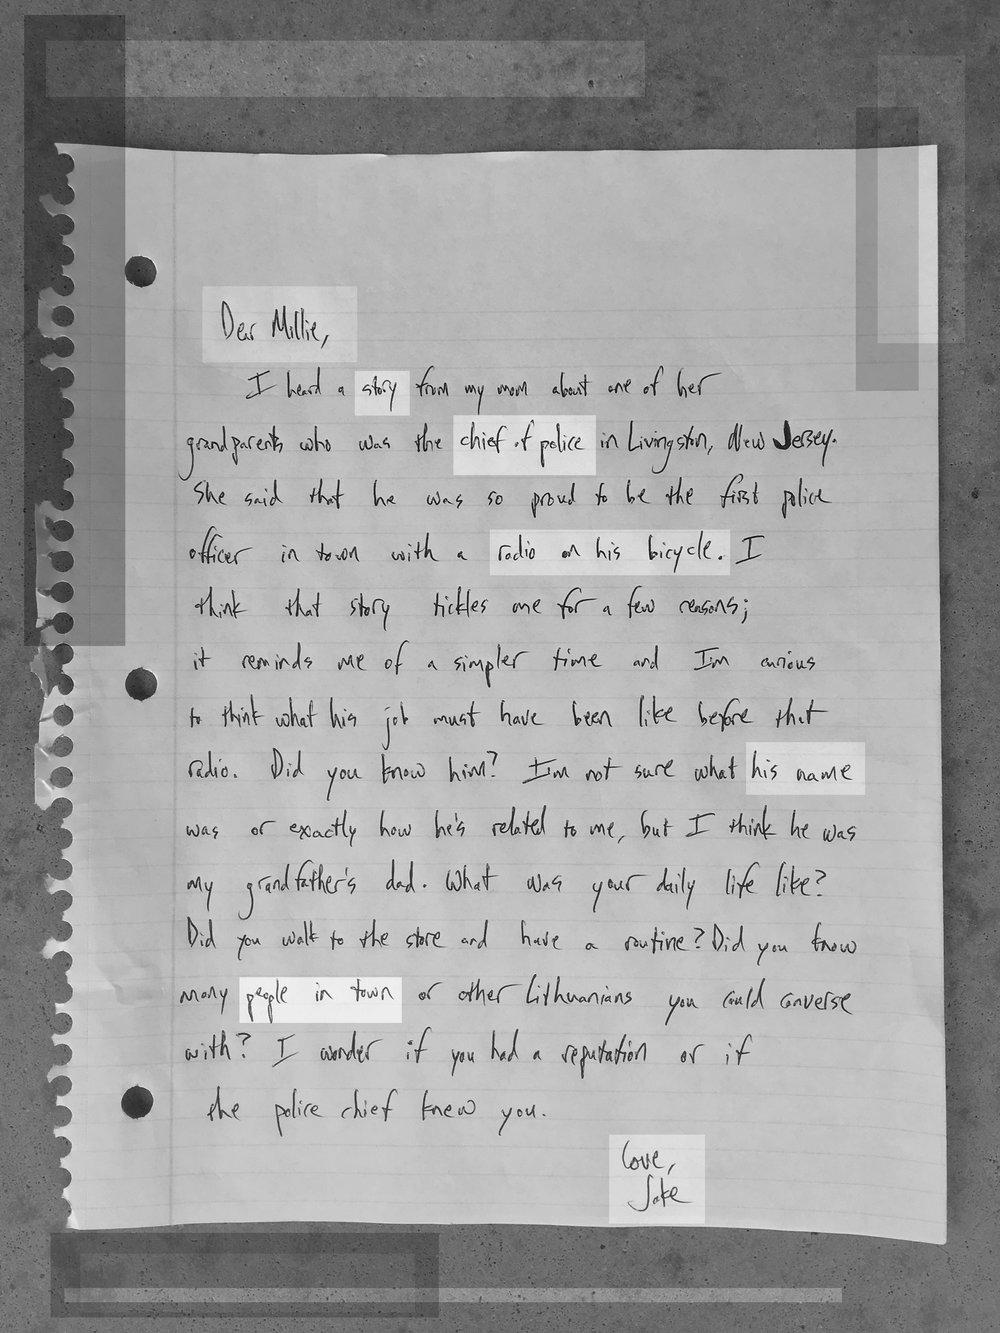 LetterToMillie(PoliceChief.jpg